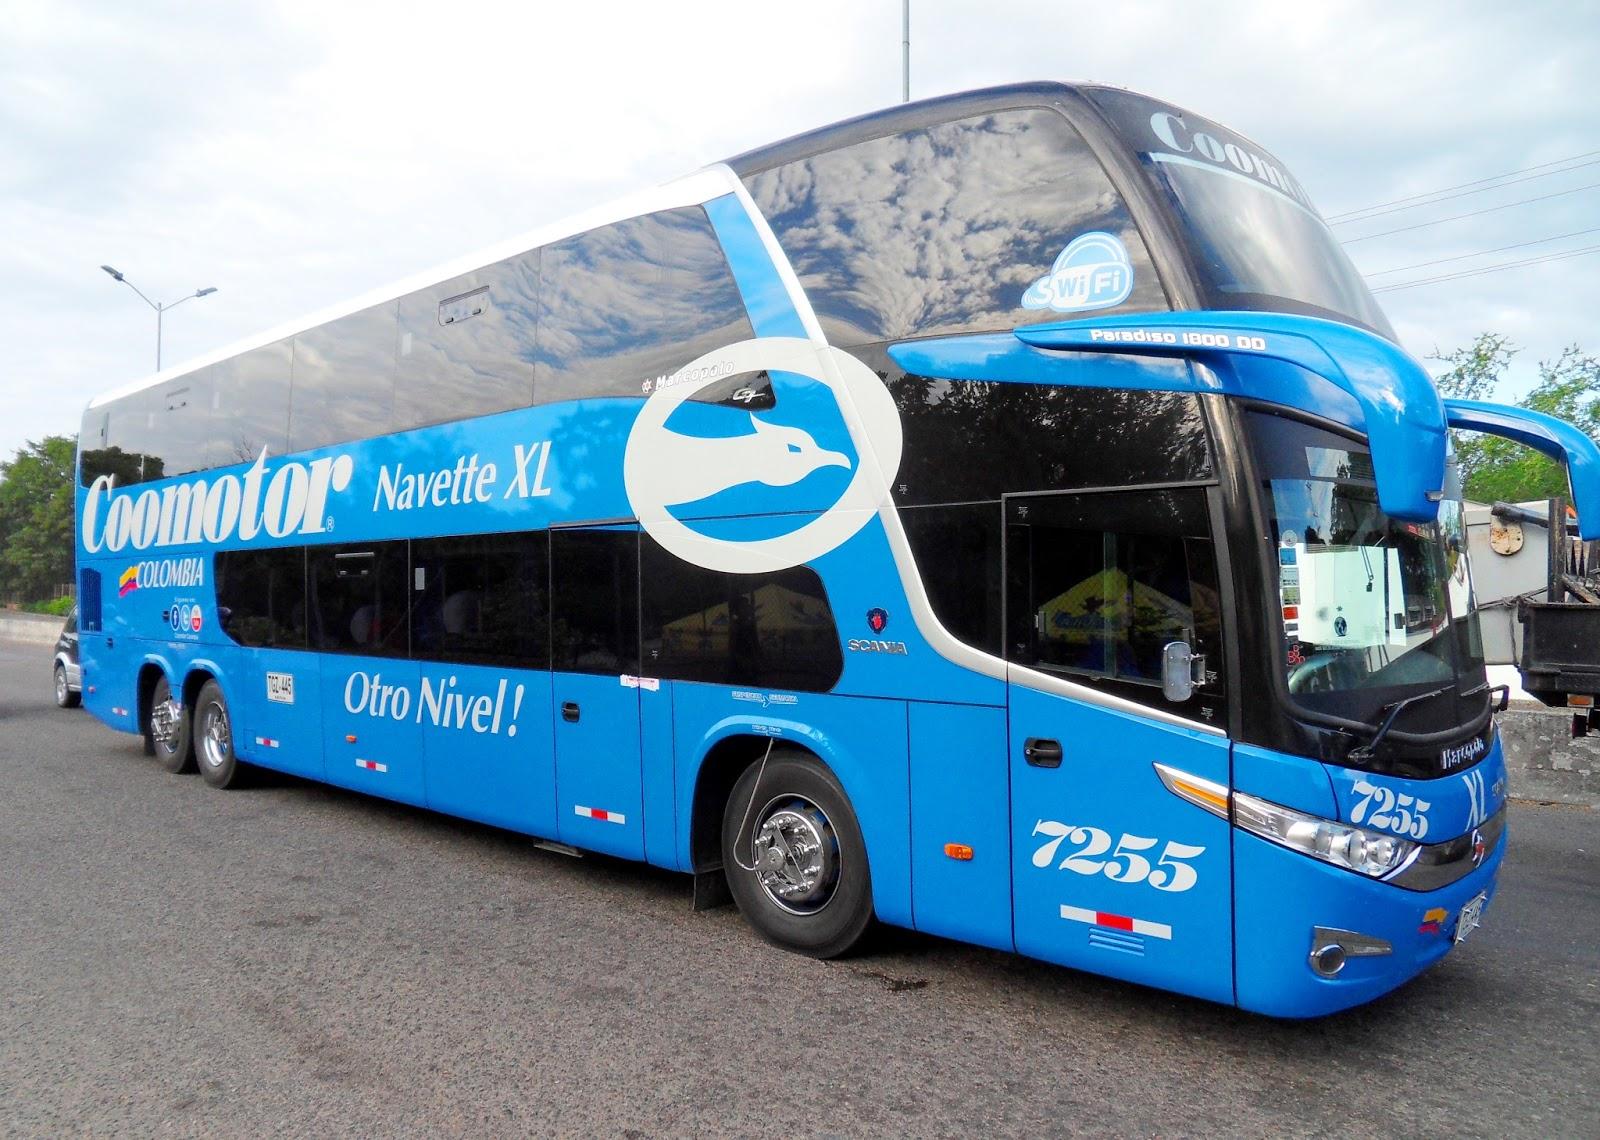 Gu a tur stica del huila buses de dos pisos coomotor a la vanguardia en el turismo - Autobuses de dos pisos ...